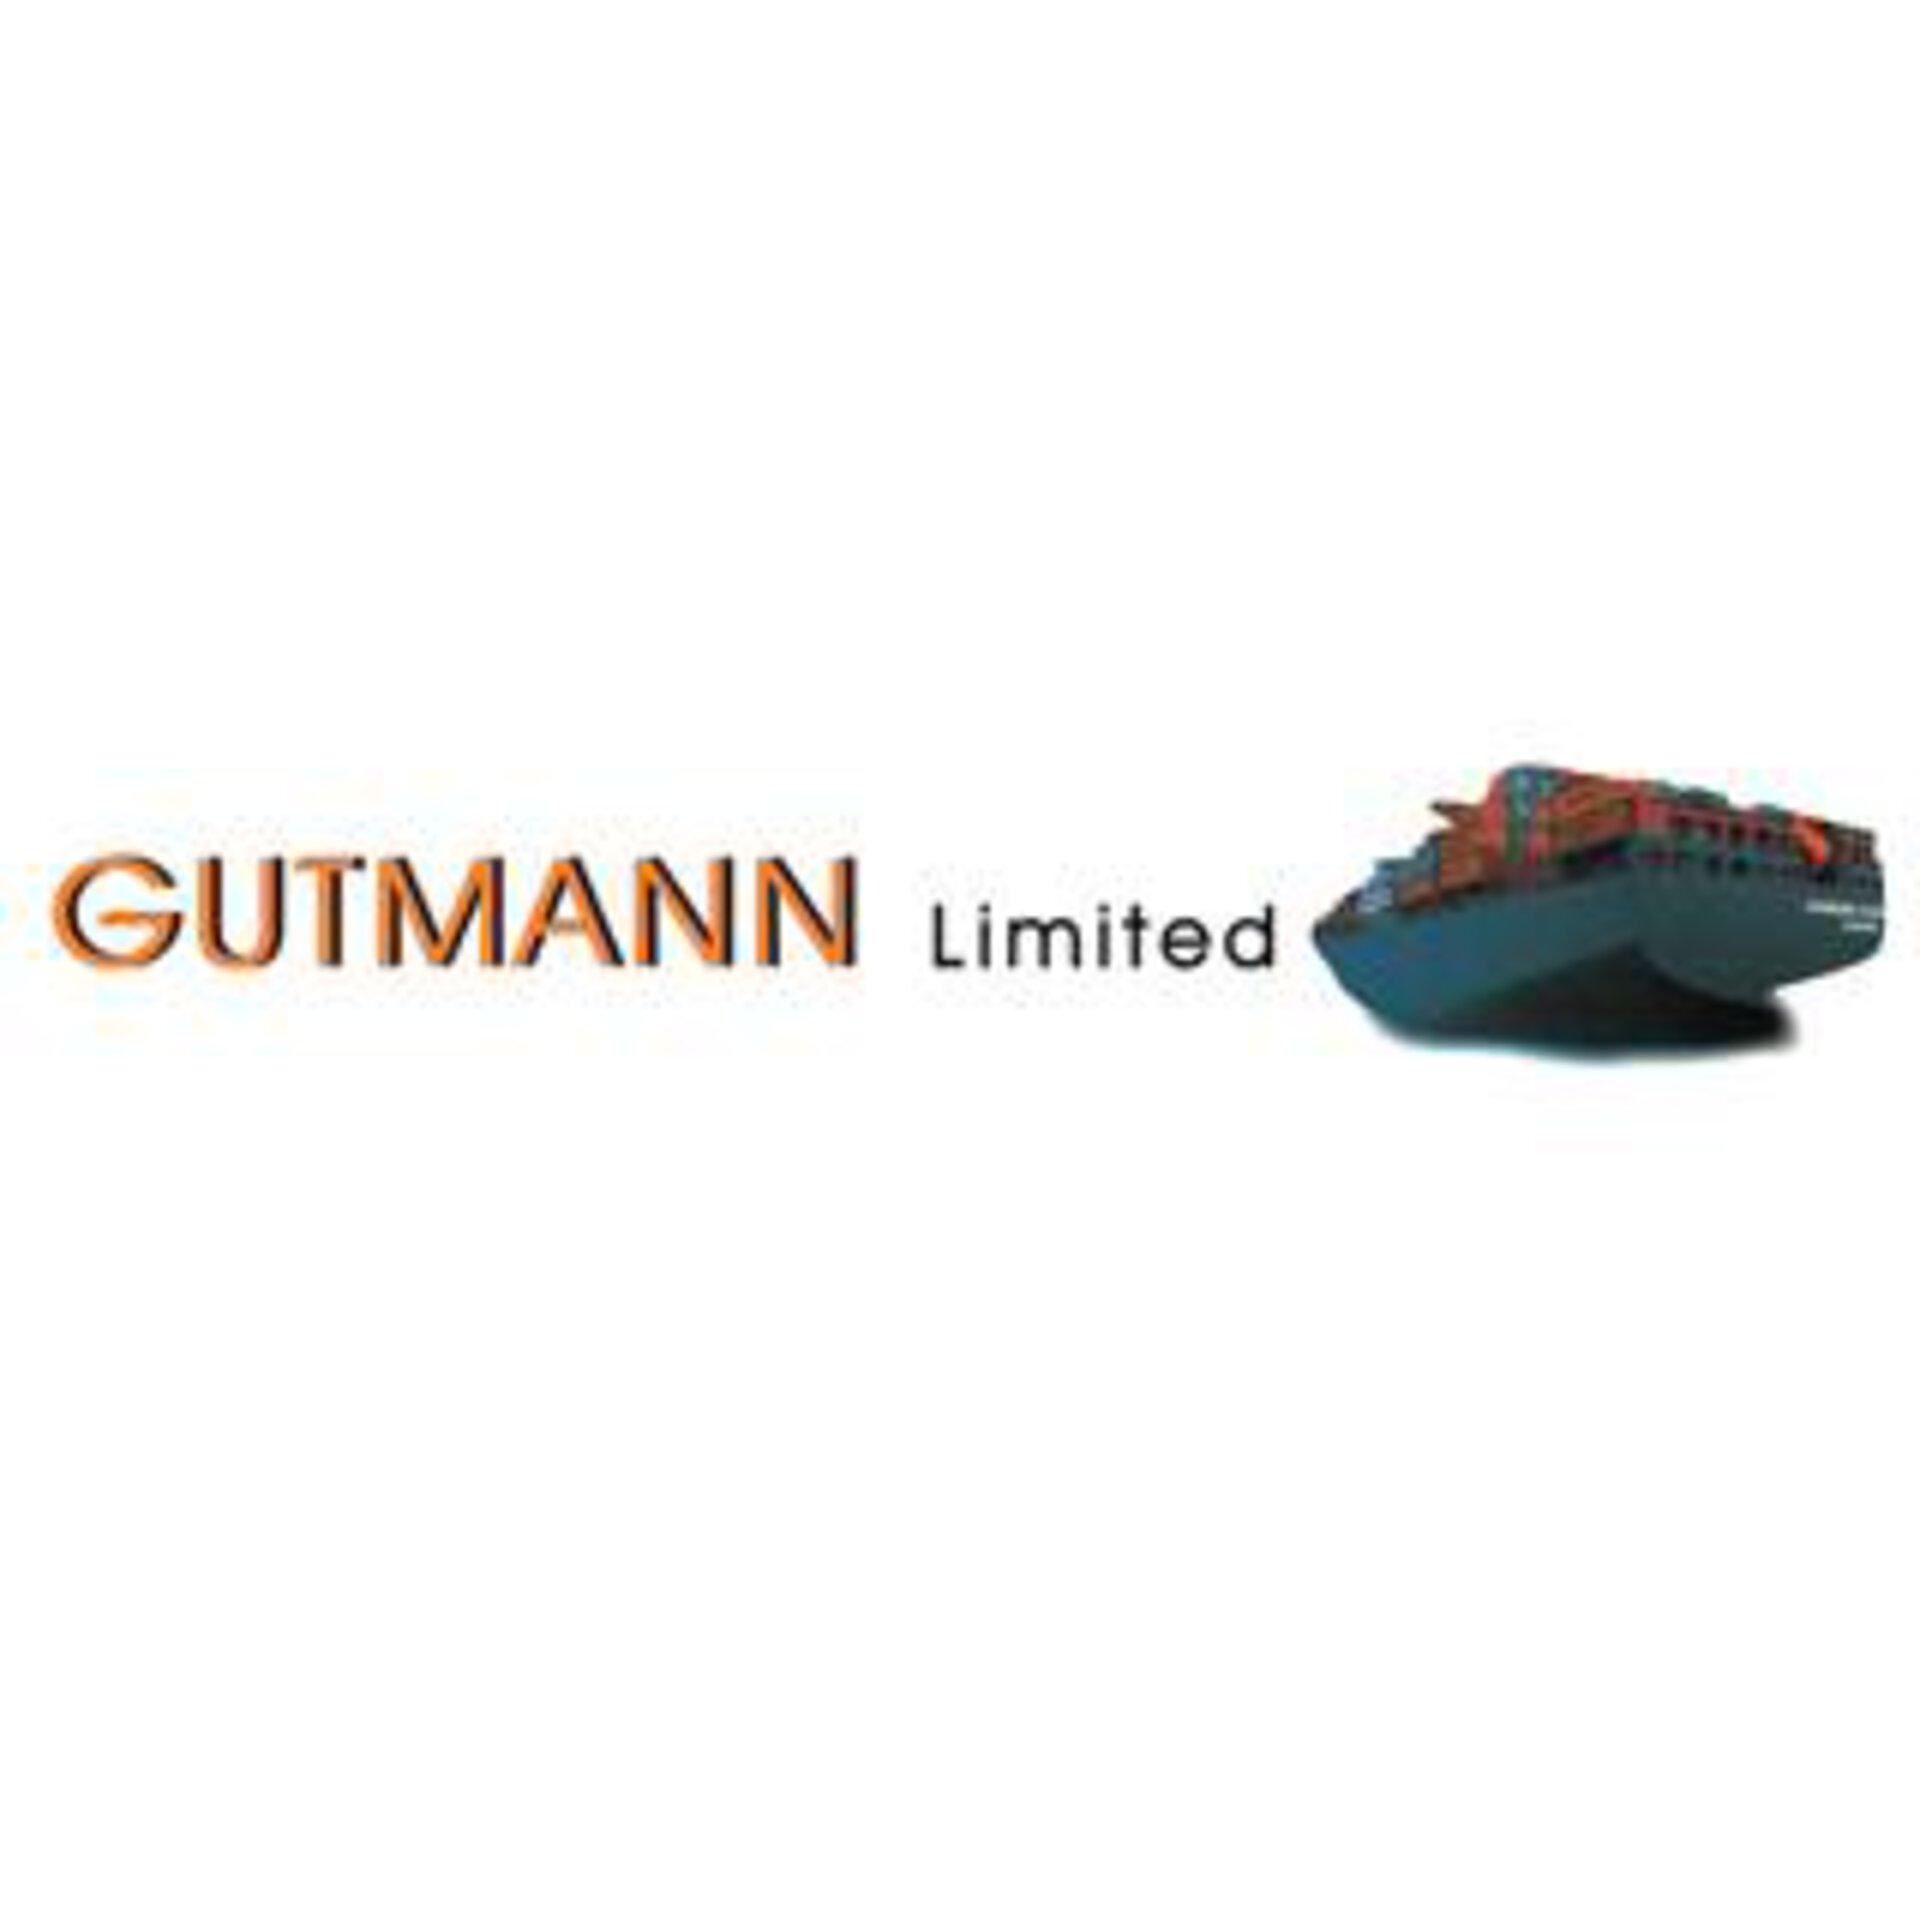 Gutmann Limited